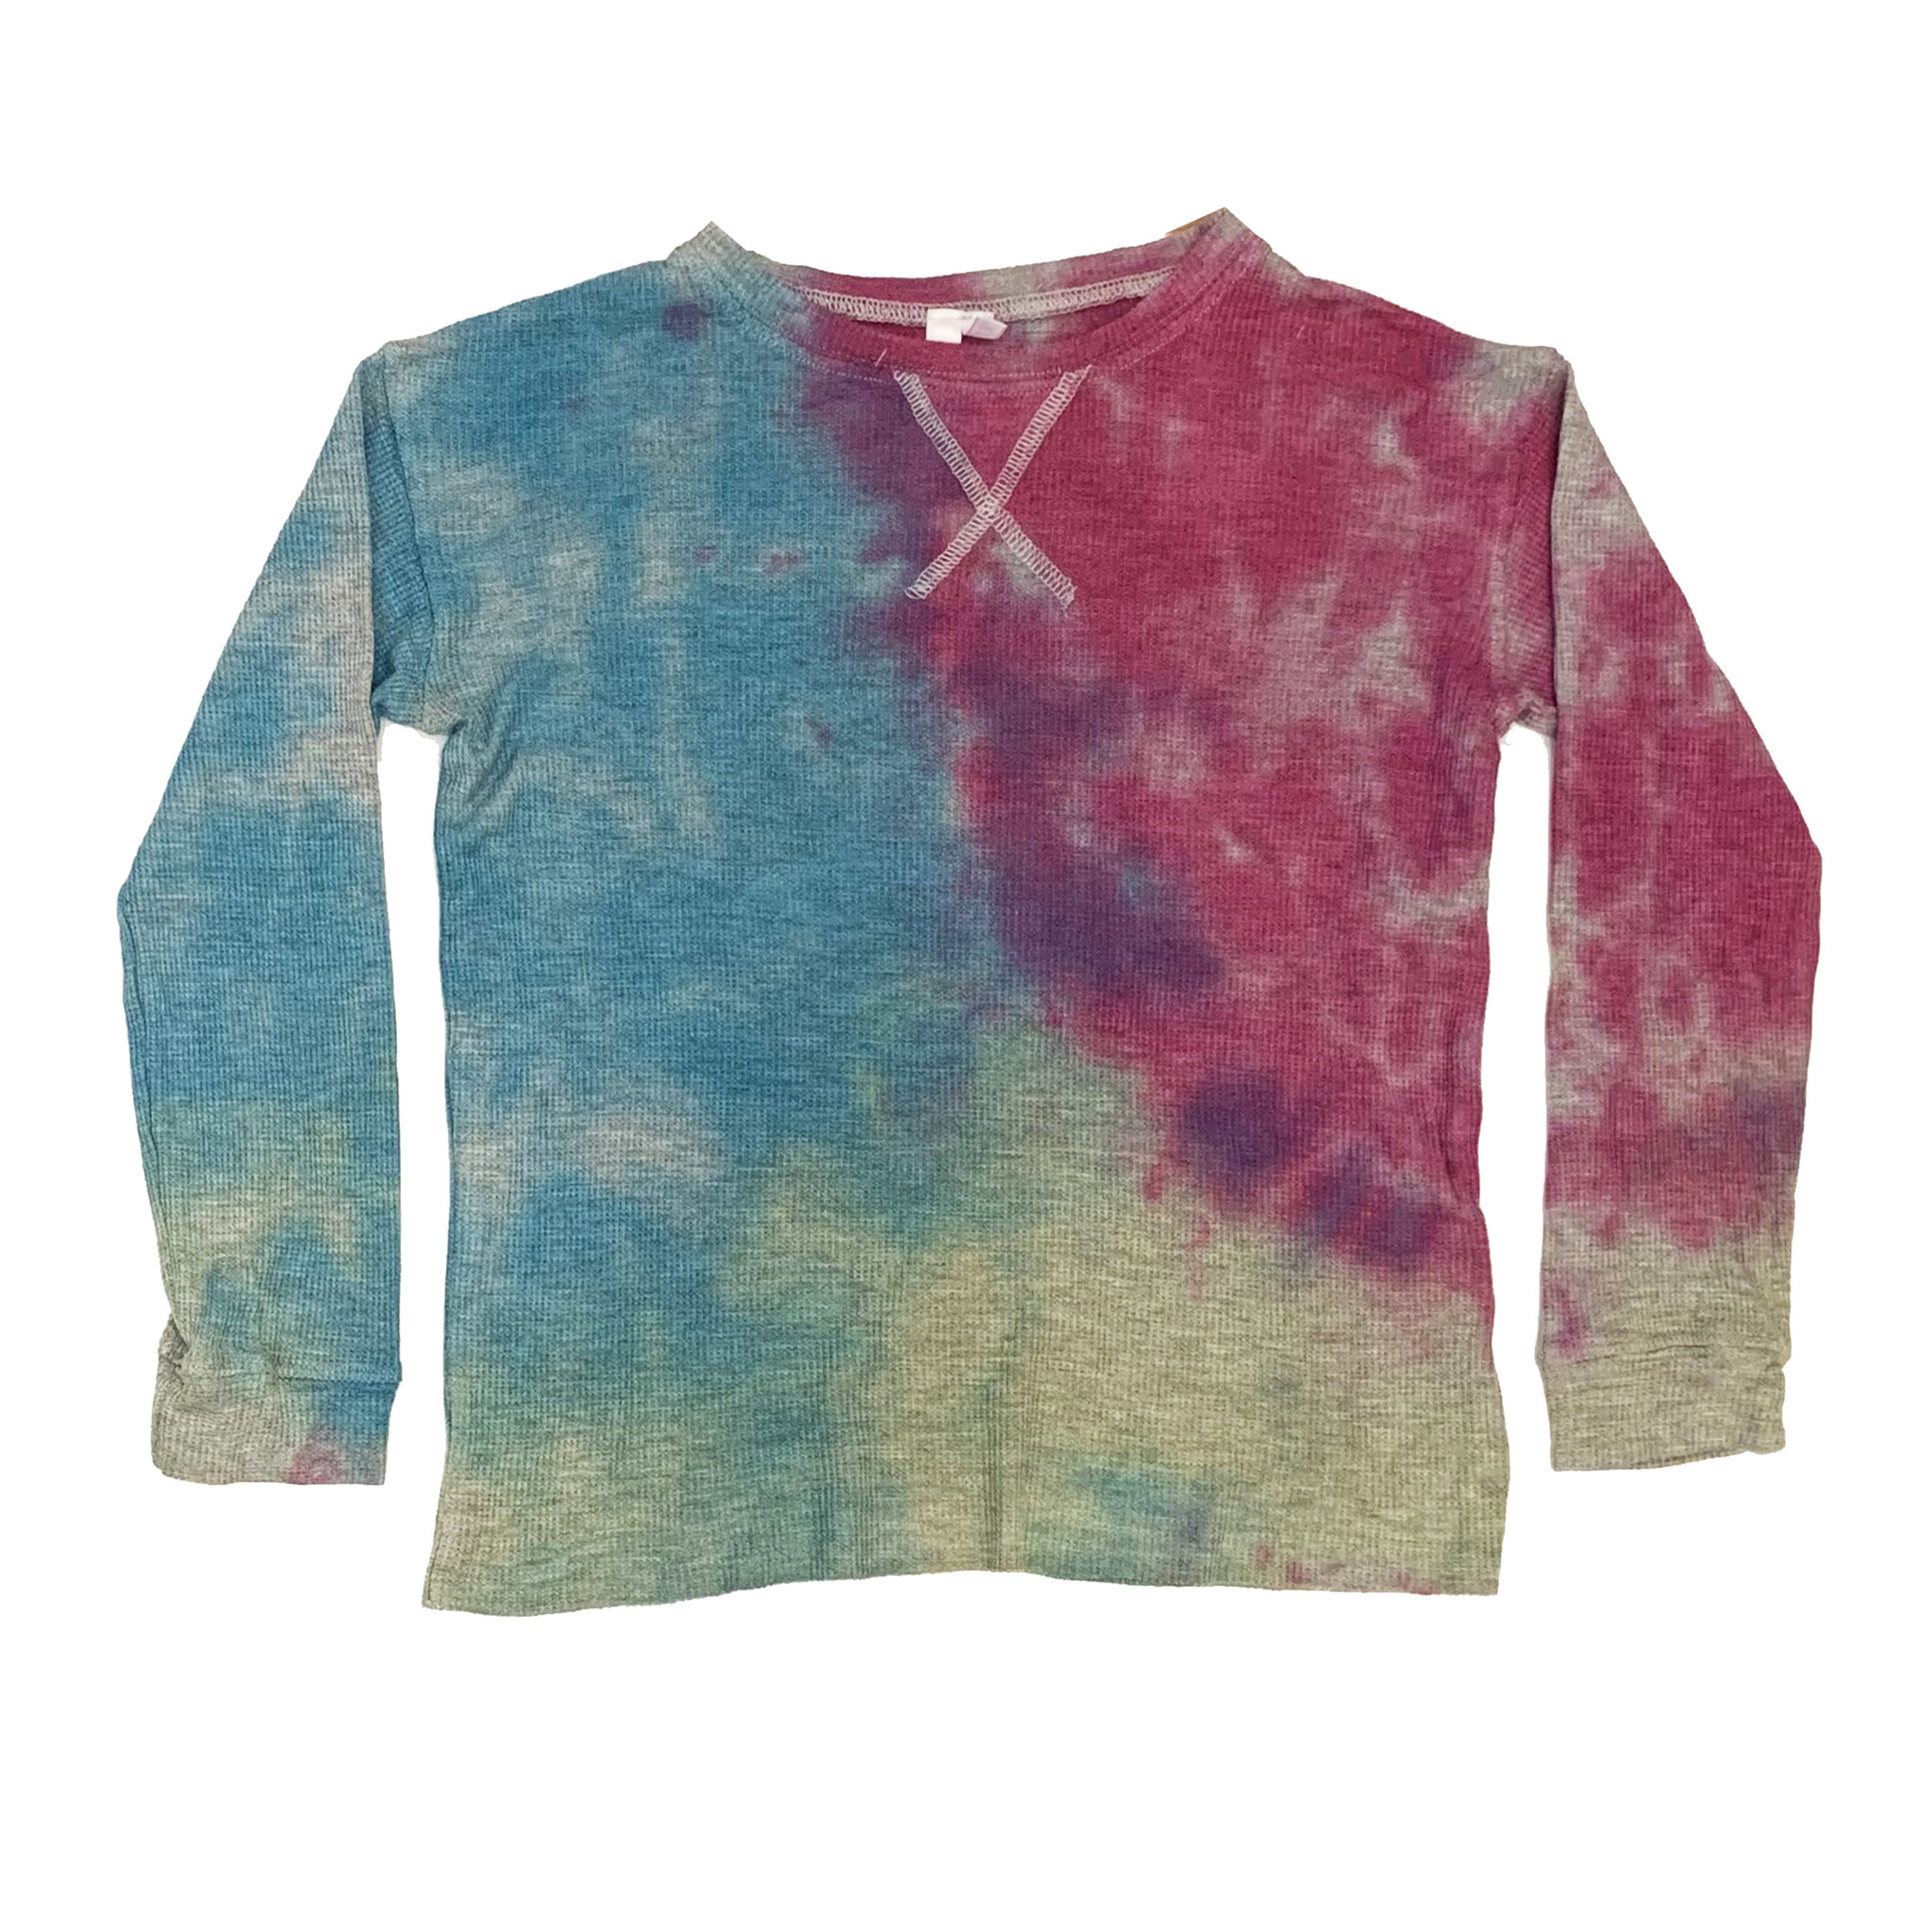 Malibu Sugar Tie Dye Thermal